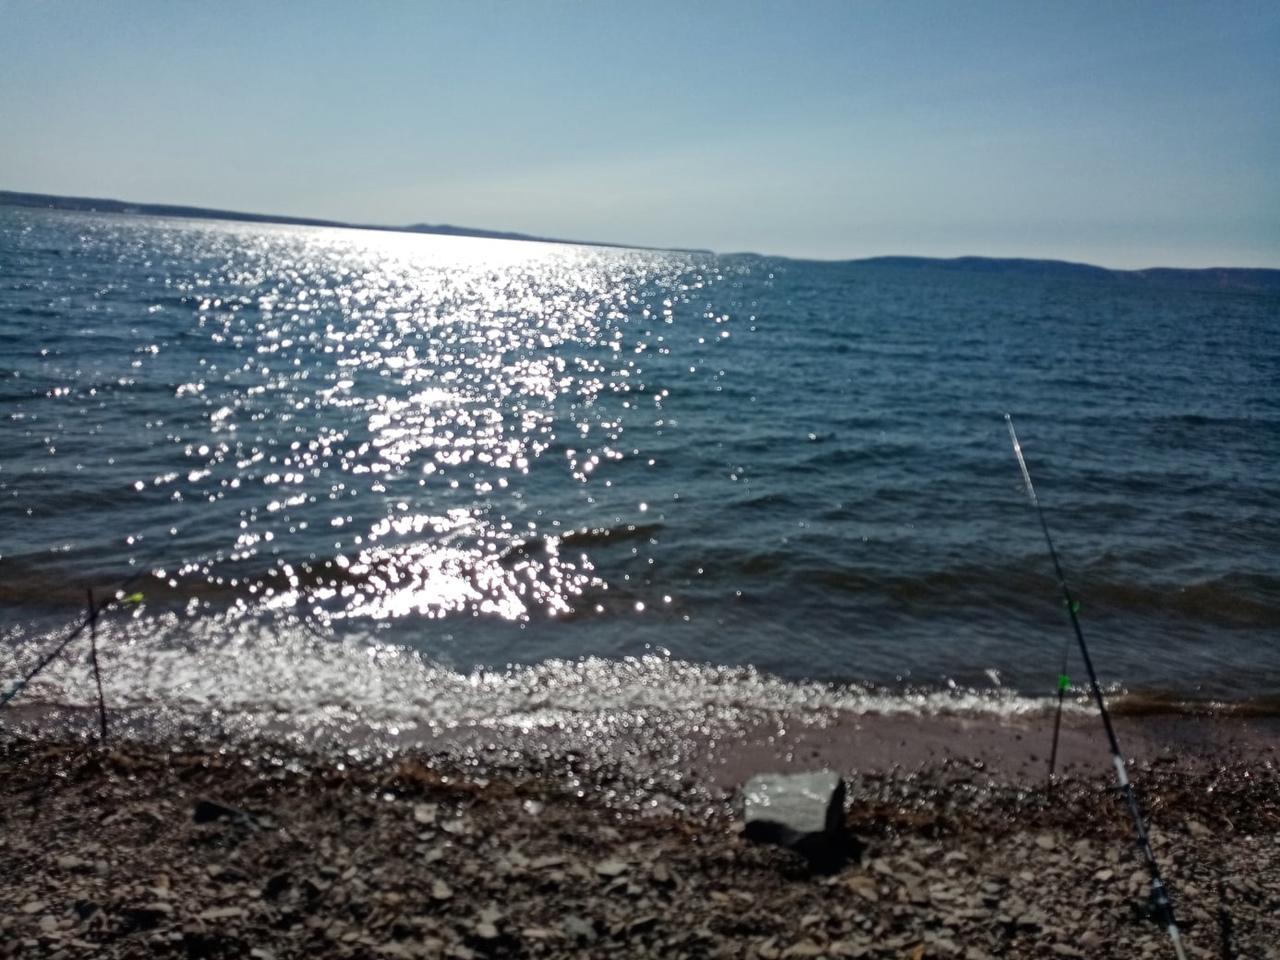 GISMETEO: Погода в Прибрежном на месяц, прогноз погоды ...